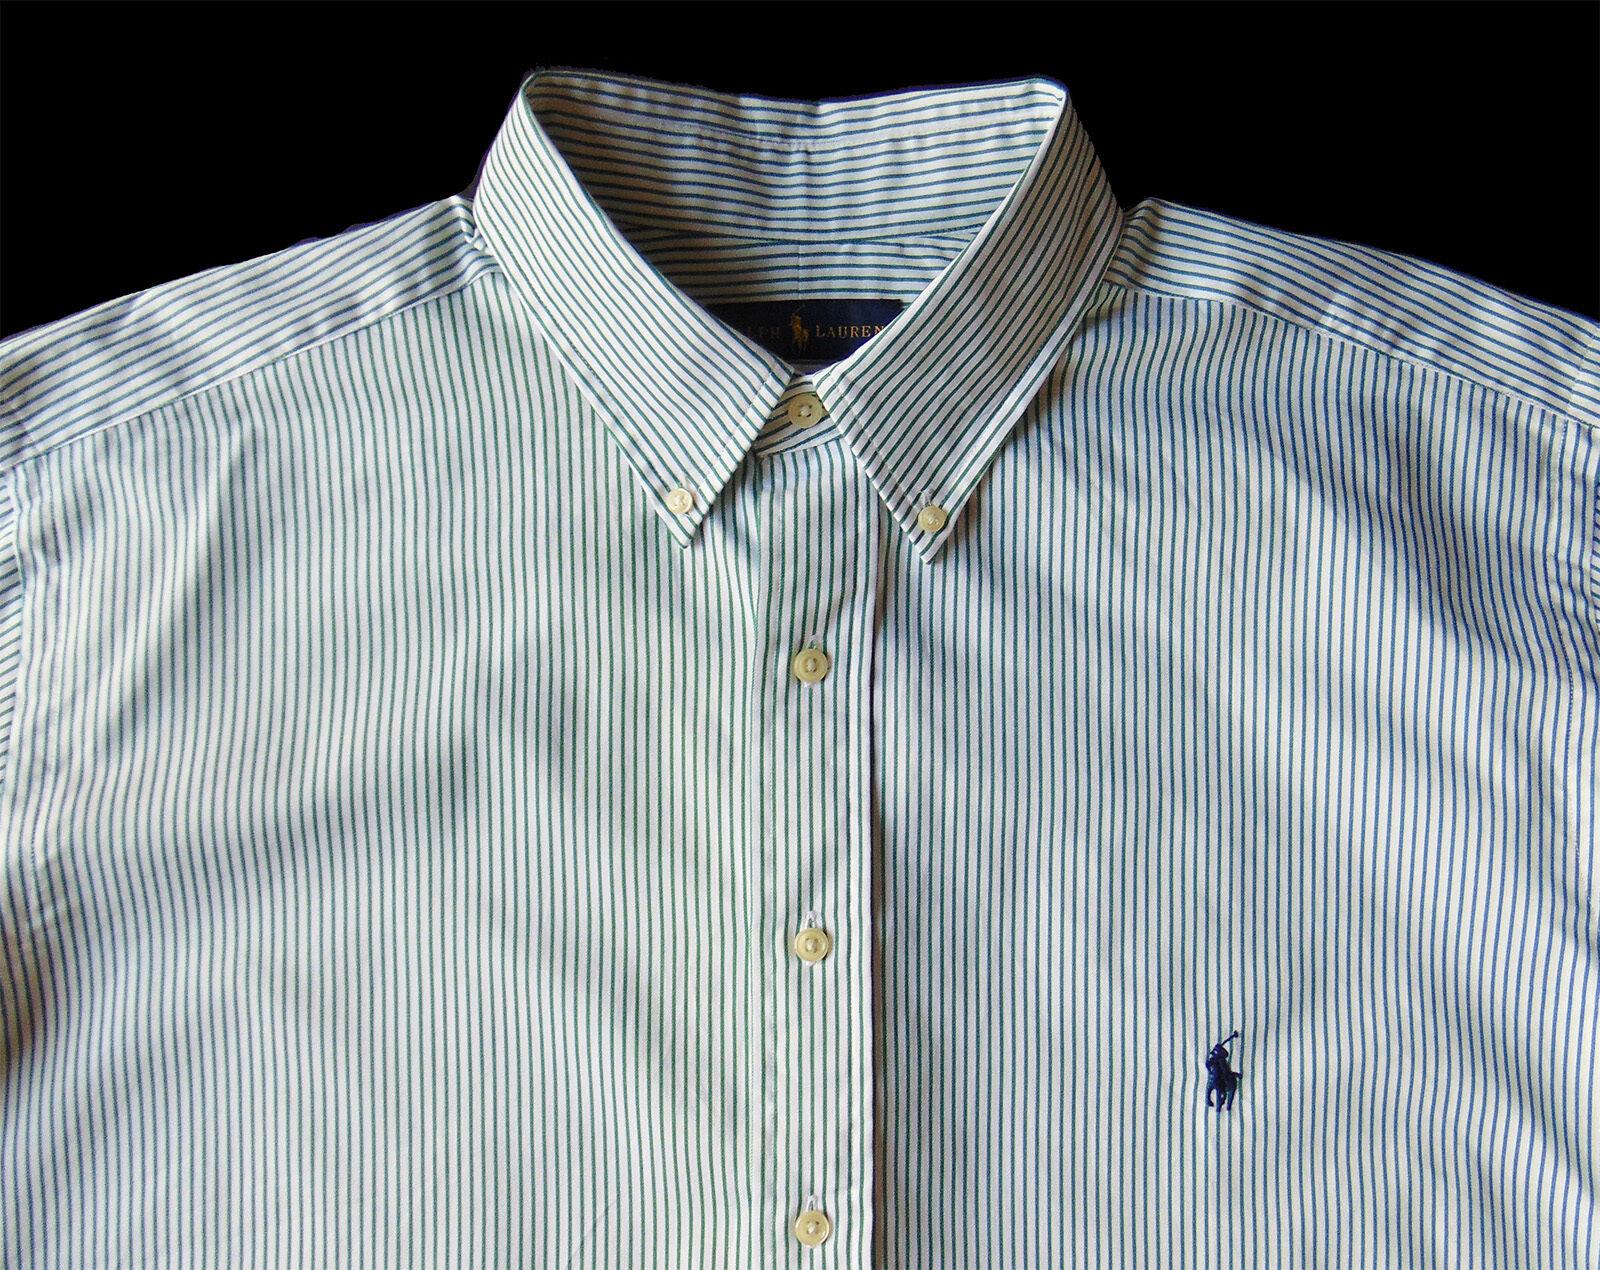 903d906644 Men's RALPH LAUREN Stripe Striped Shirt 2XB 2X BIG NWT NEW Nice ...